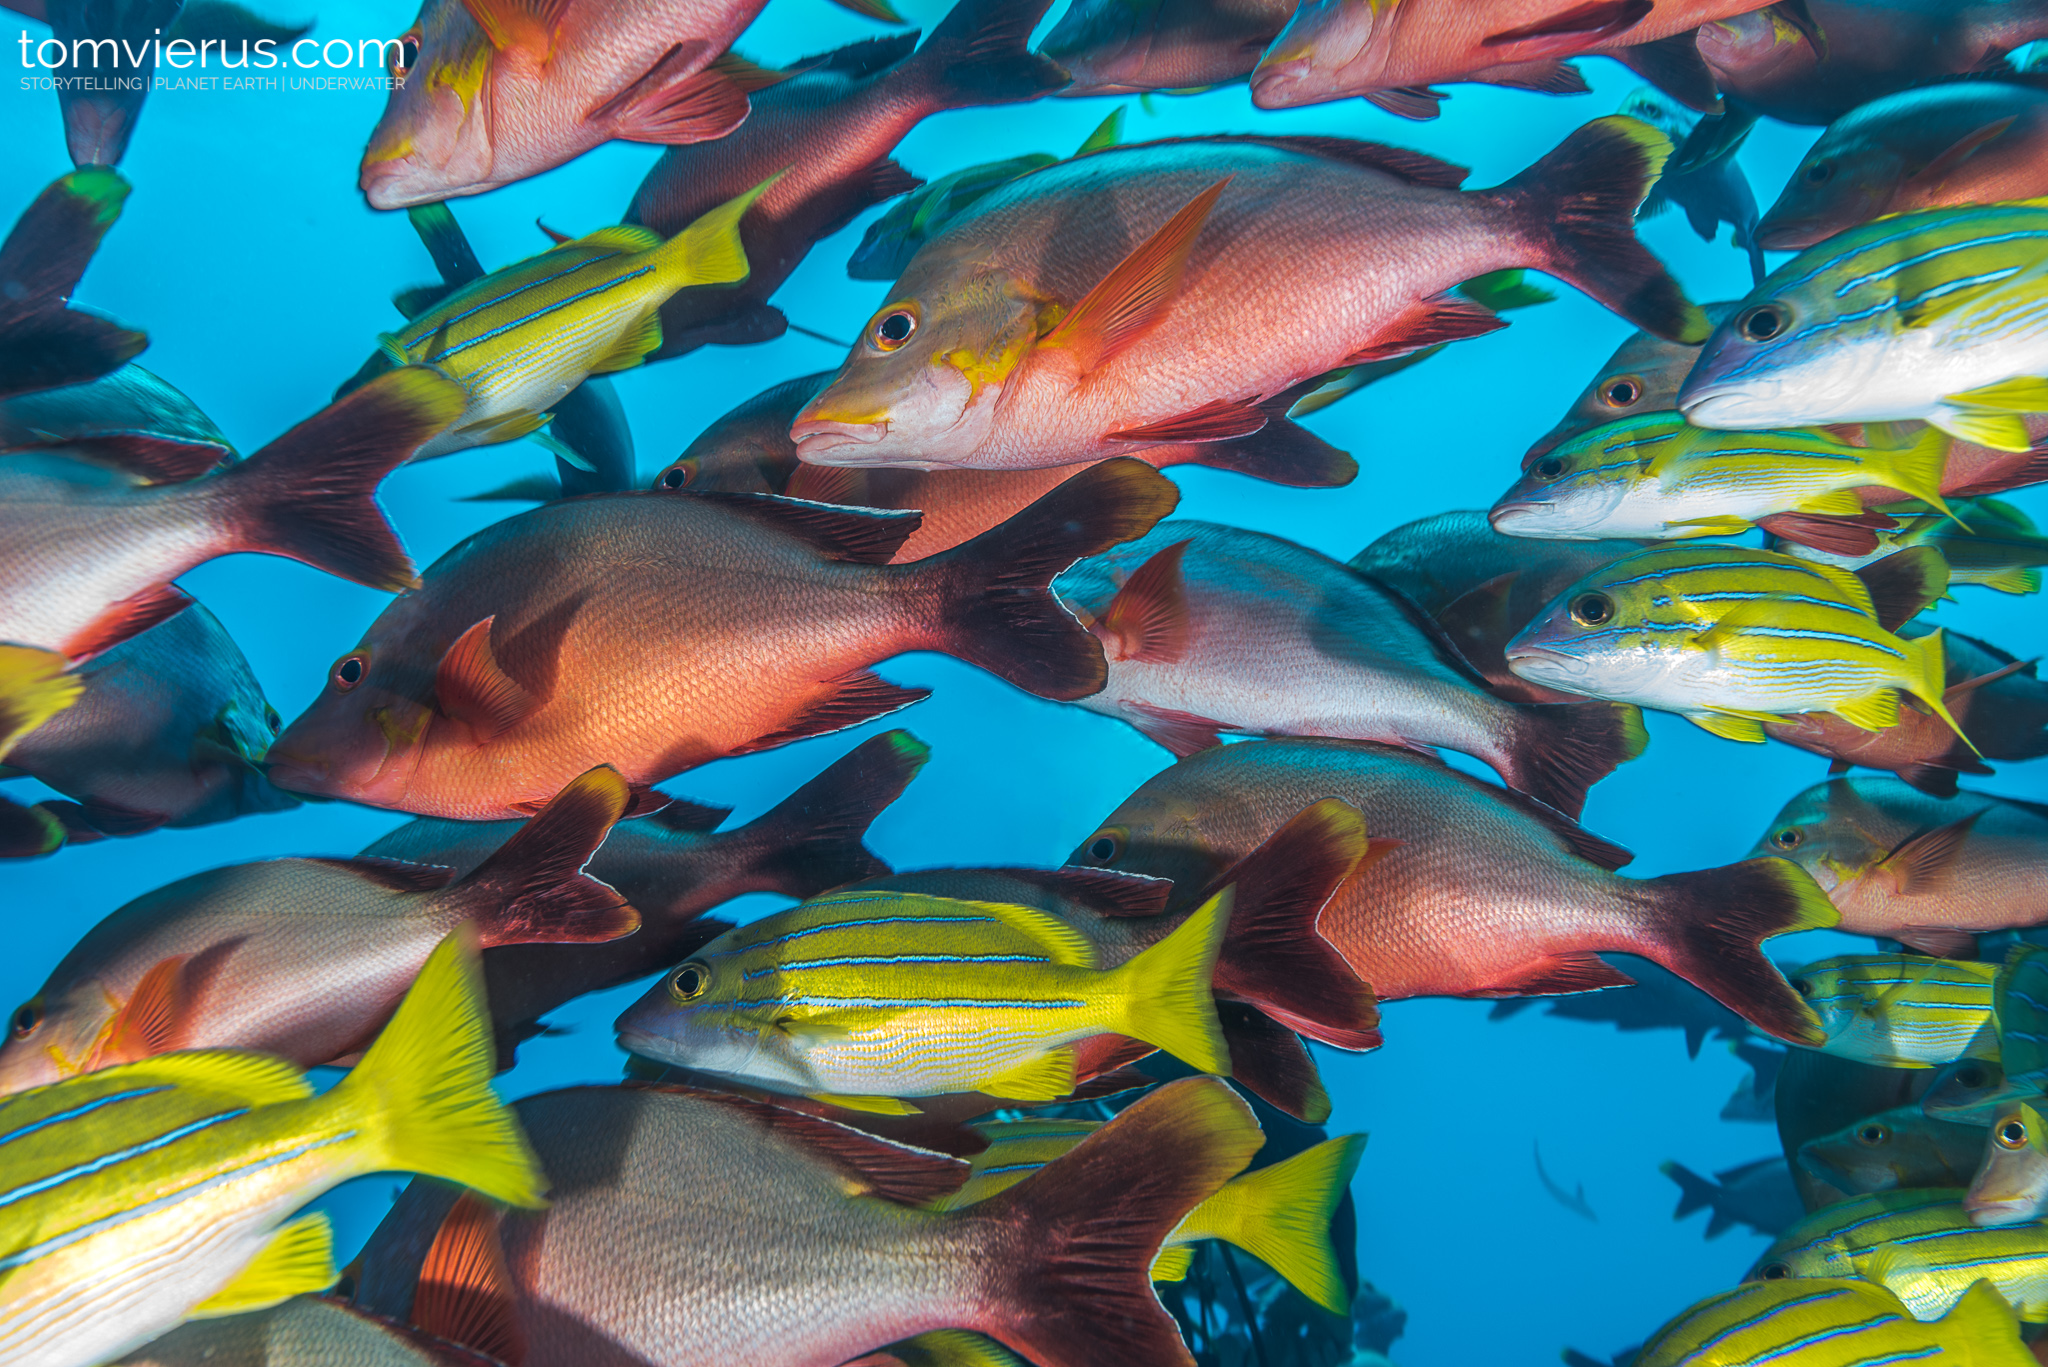 Diving, Pacific, Ocean, Valle blanche, shark dive